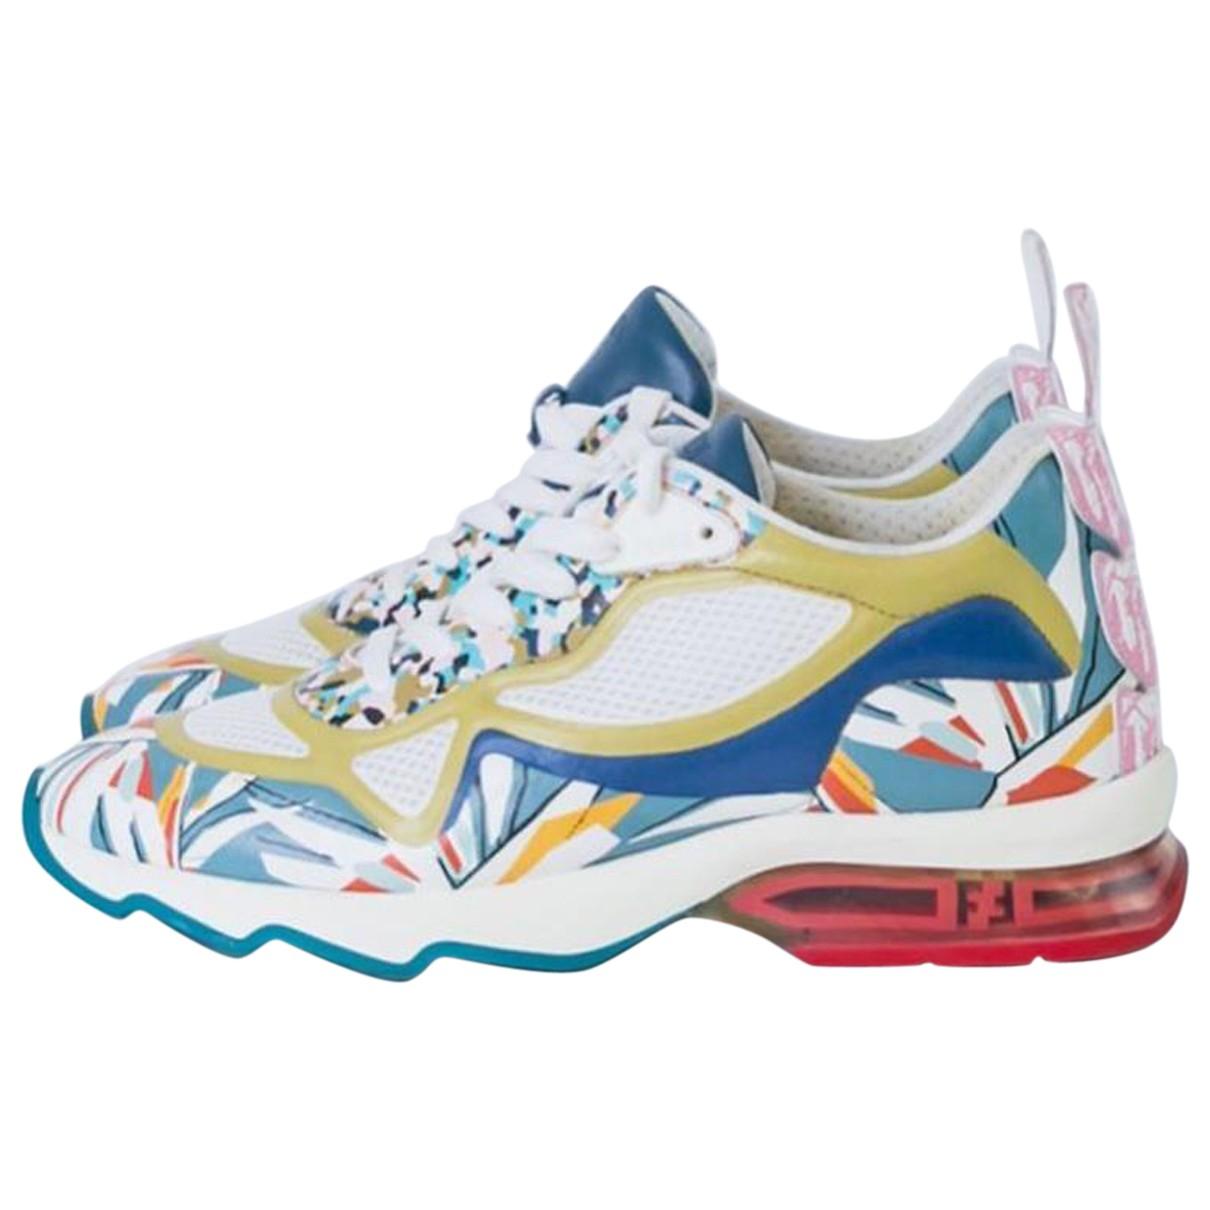 Fendi \N Sneakers in  Bunt Leinen